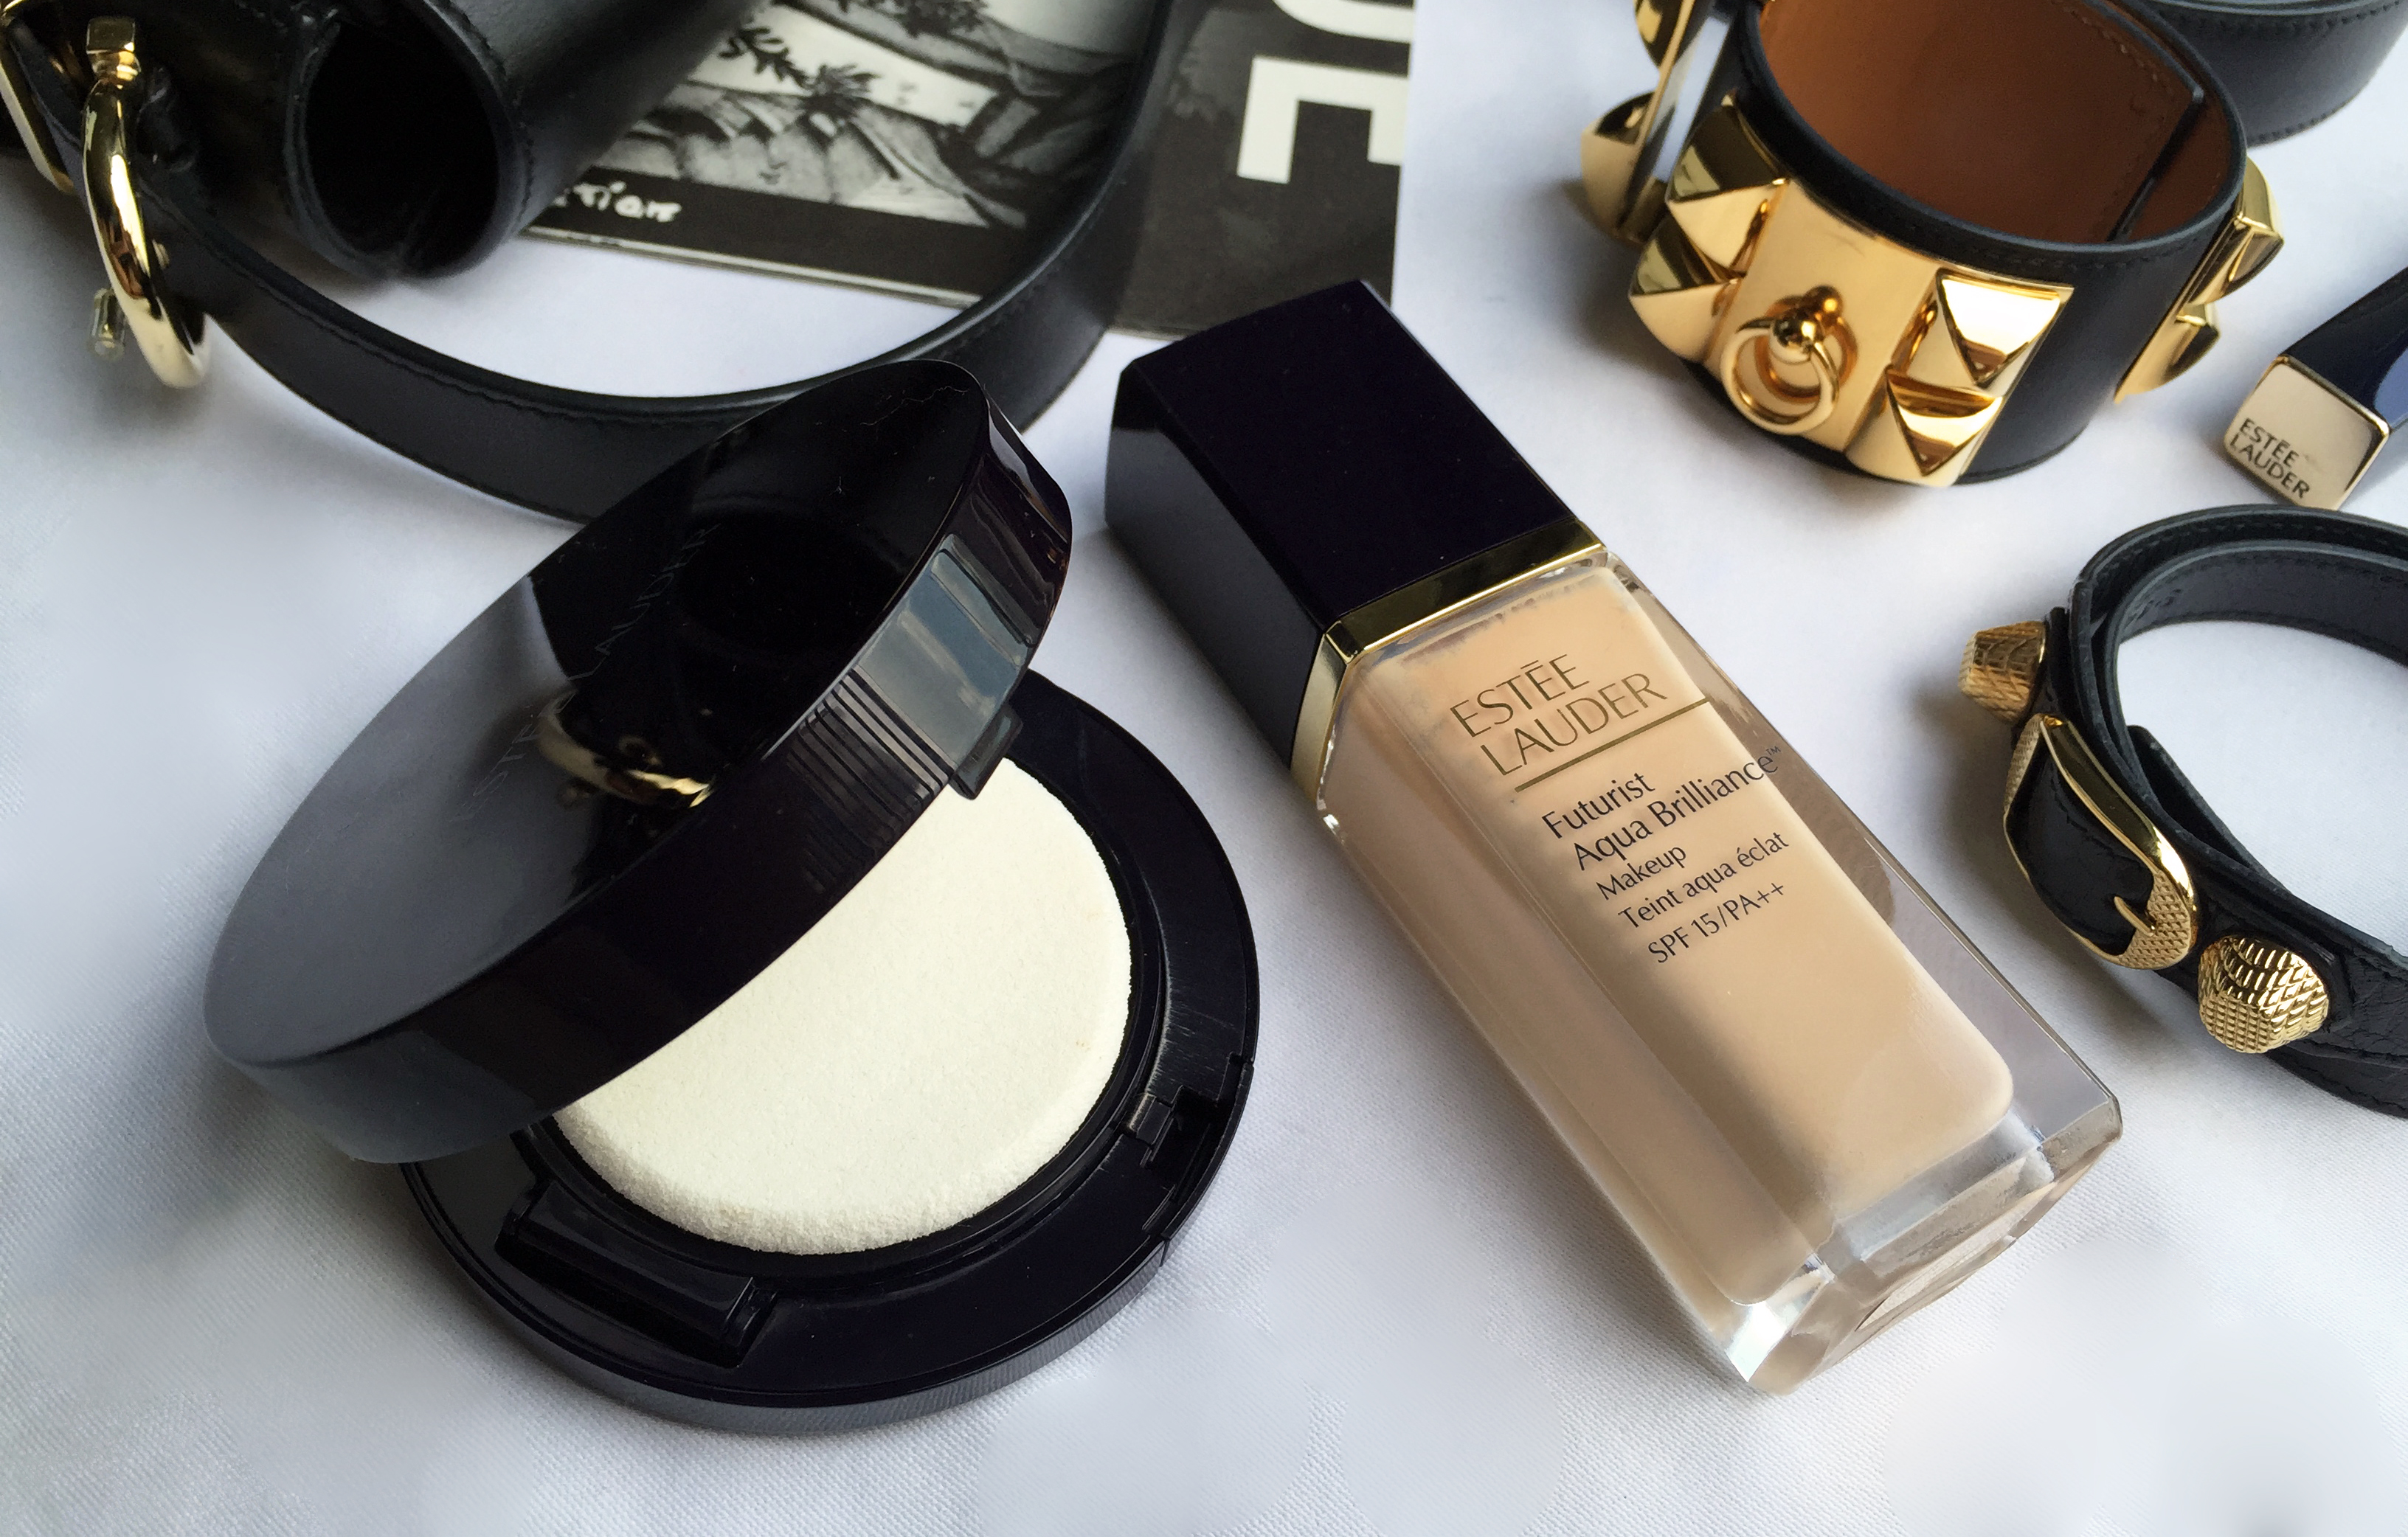 Estee Lauder Futurist Aqua Brilliance Makeup - Silverkis' World